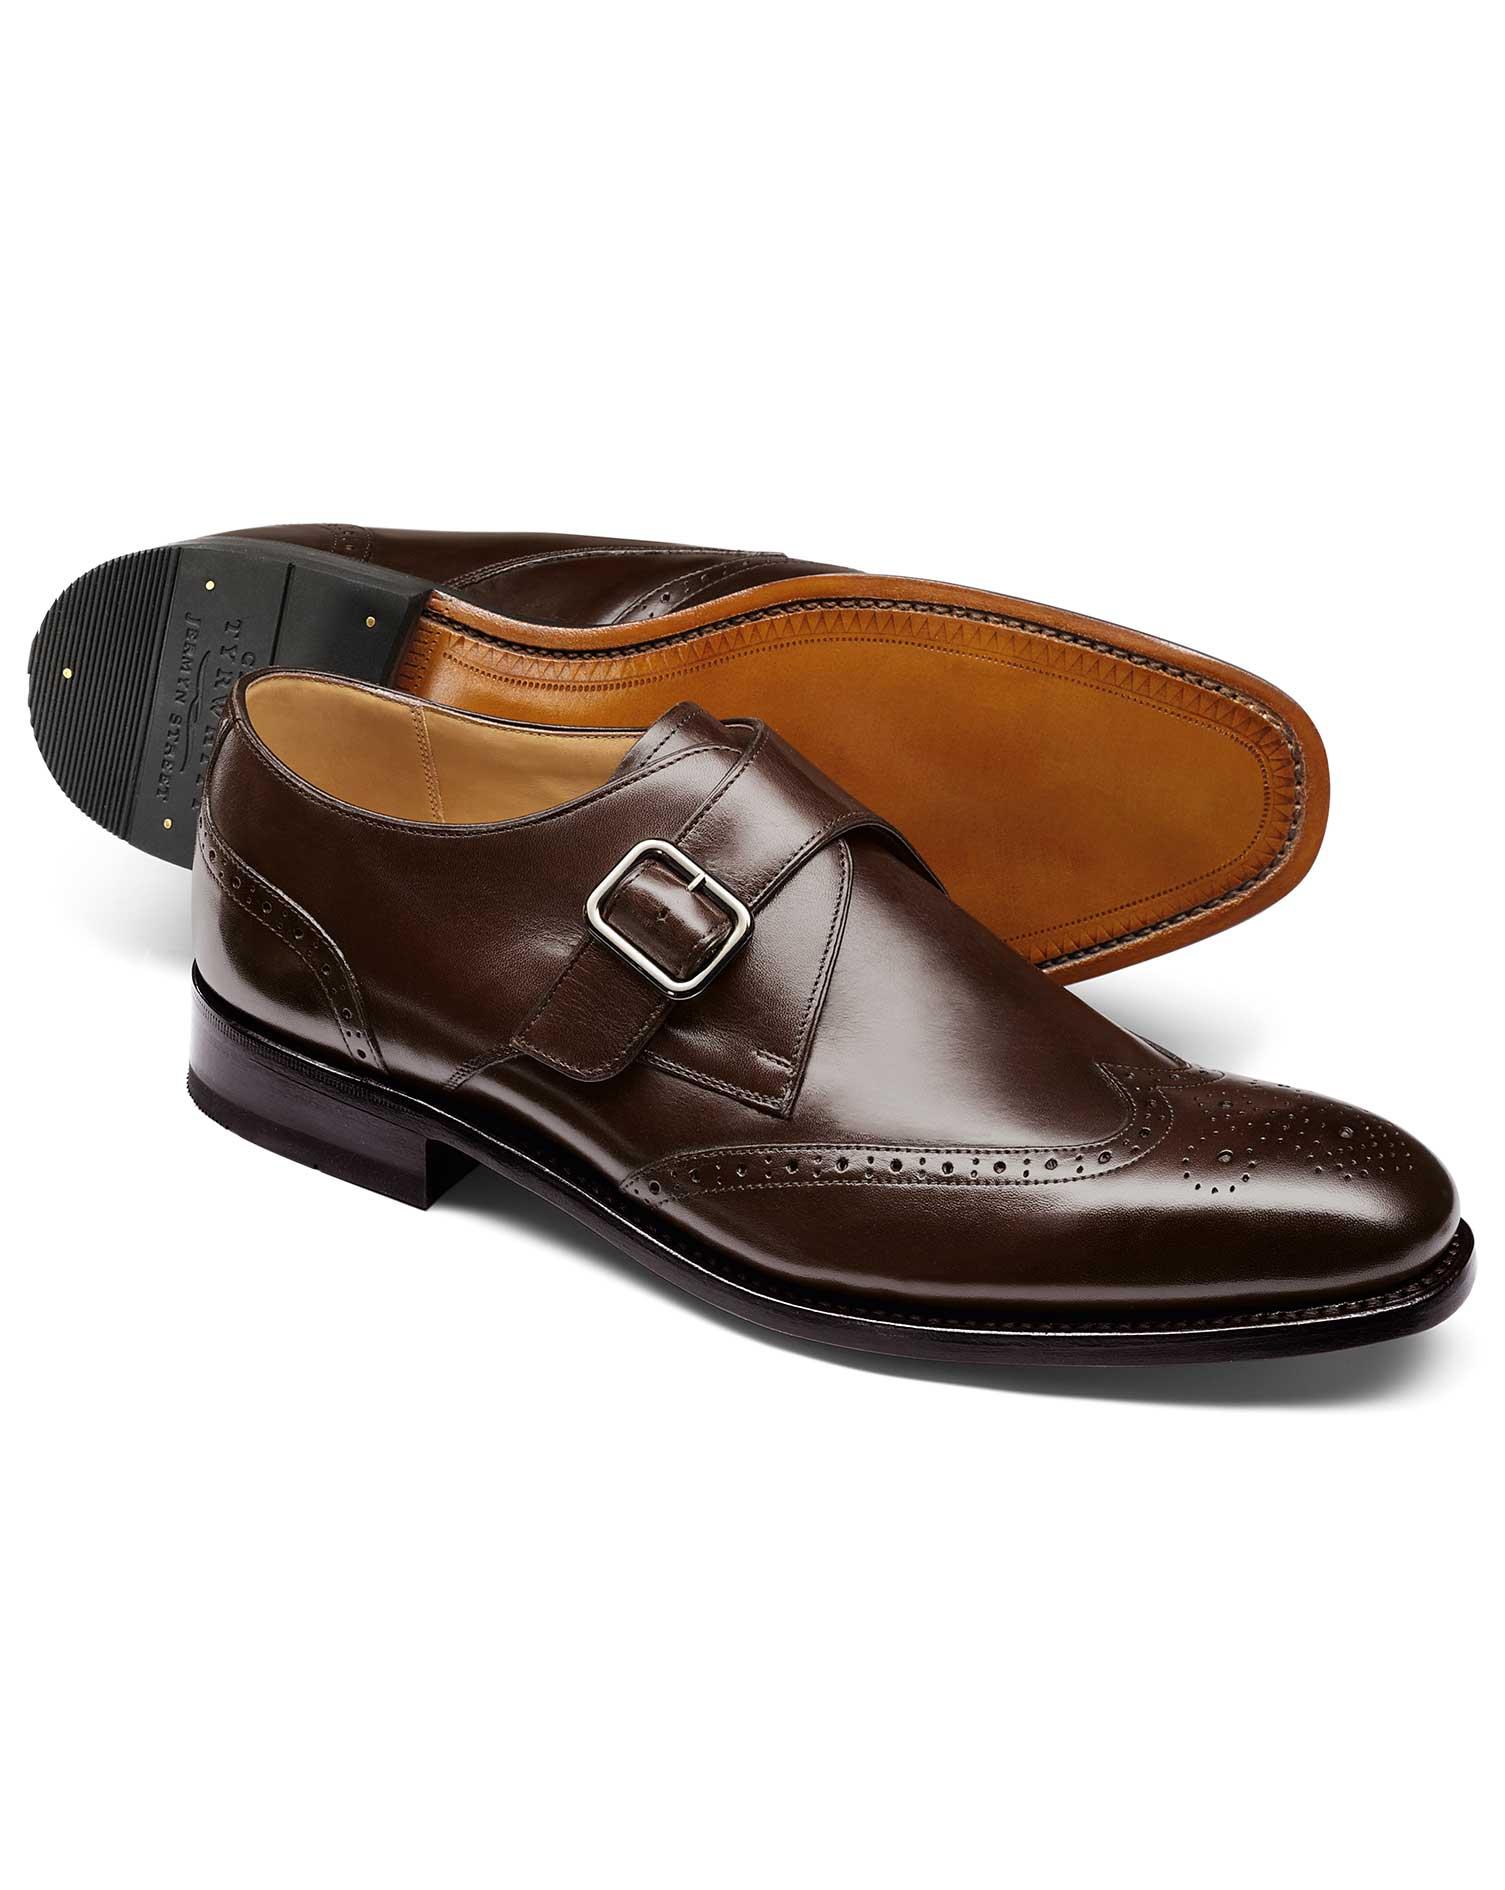 À Vendre Pas Cher Authentique Pas Cher Obtenir Authentique Charles Tyrwhitt Goodyear Welted Brogue Monk Shoe Size 10.5 W by FnyqfeE7